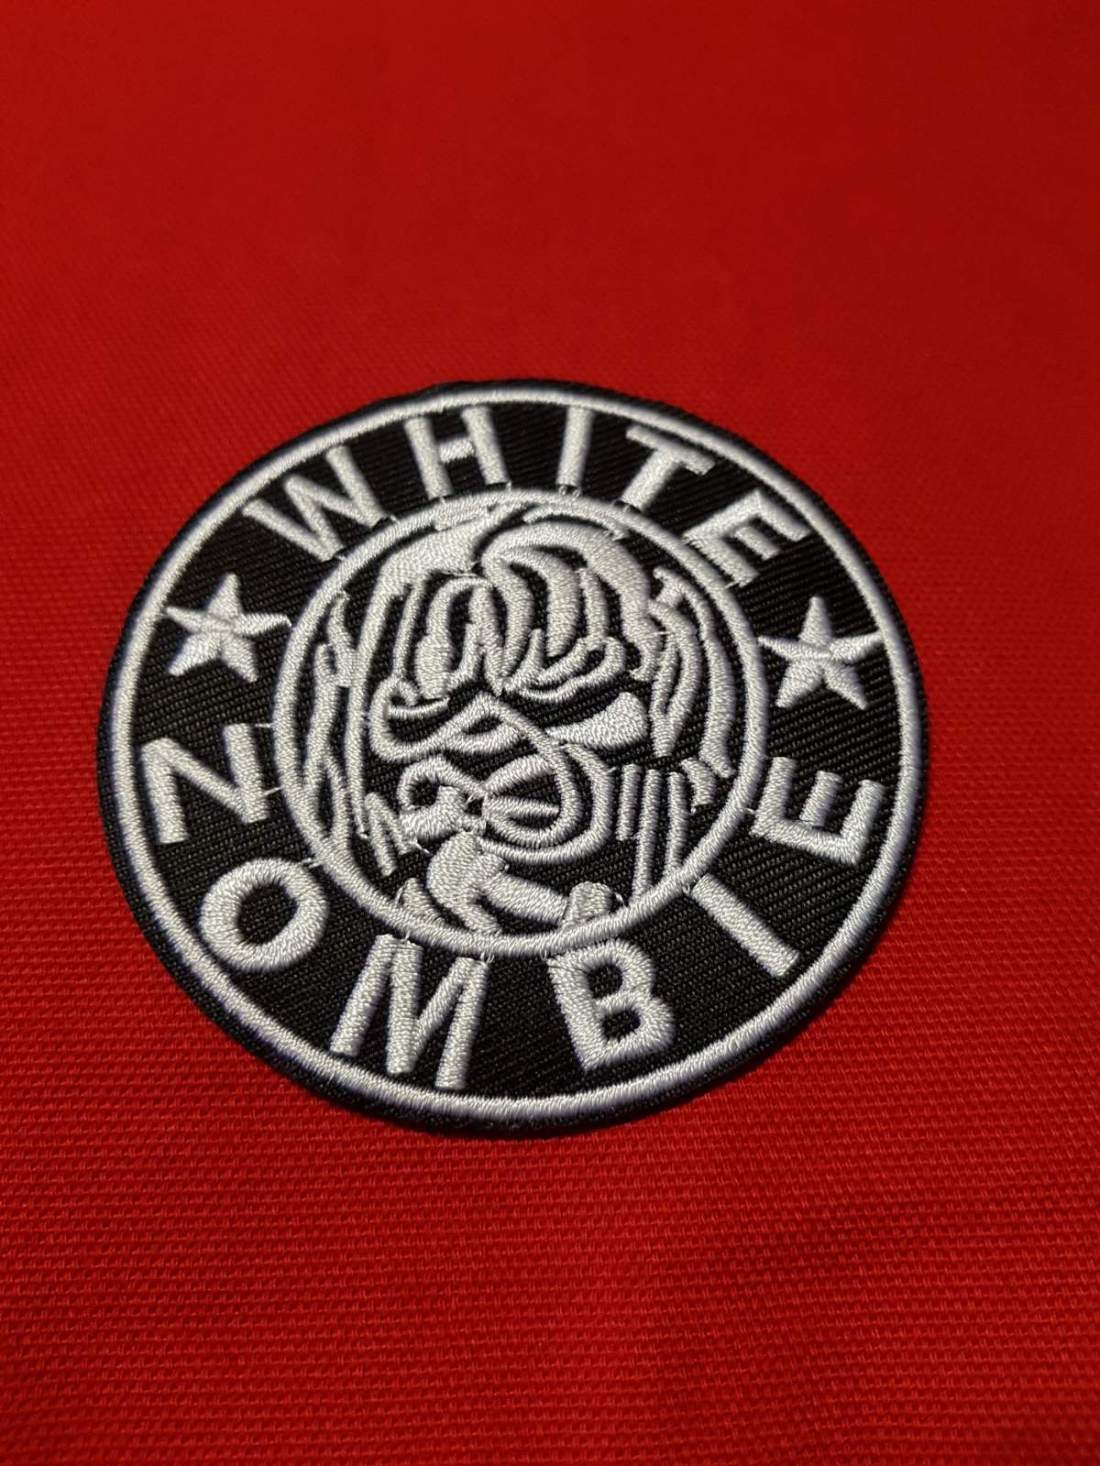 WHITE ZOMBIE FELVARRÓ